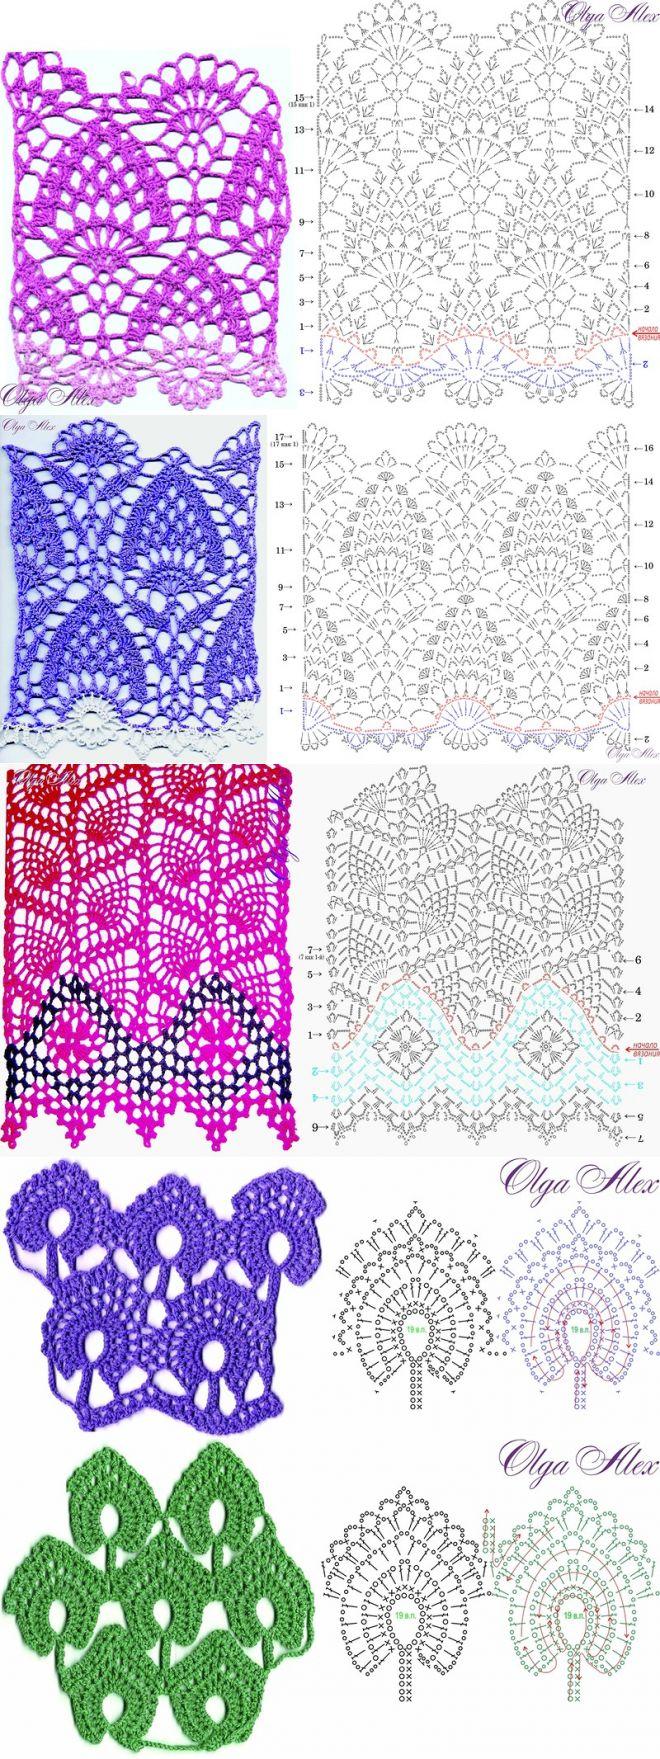 2270 Best Crochet Images On Pinterest Dresses By Tashiab Basic Granny Square Stitch Diagram Mustersammlung